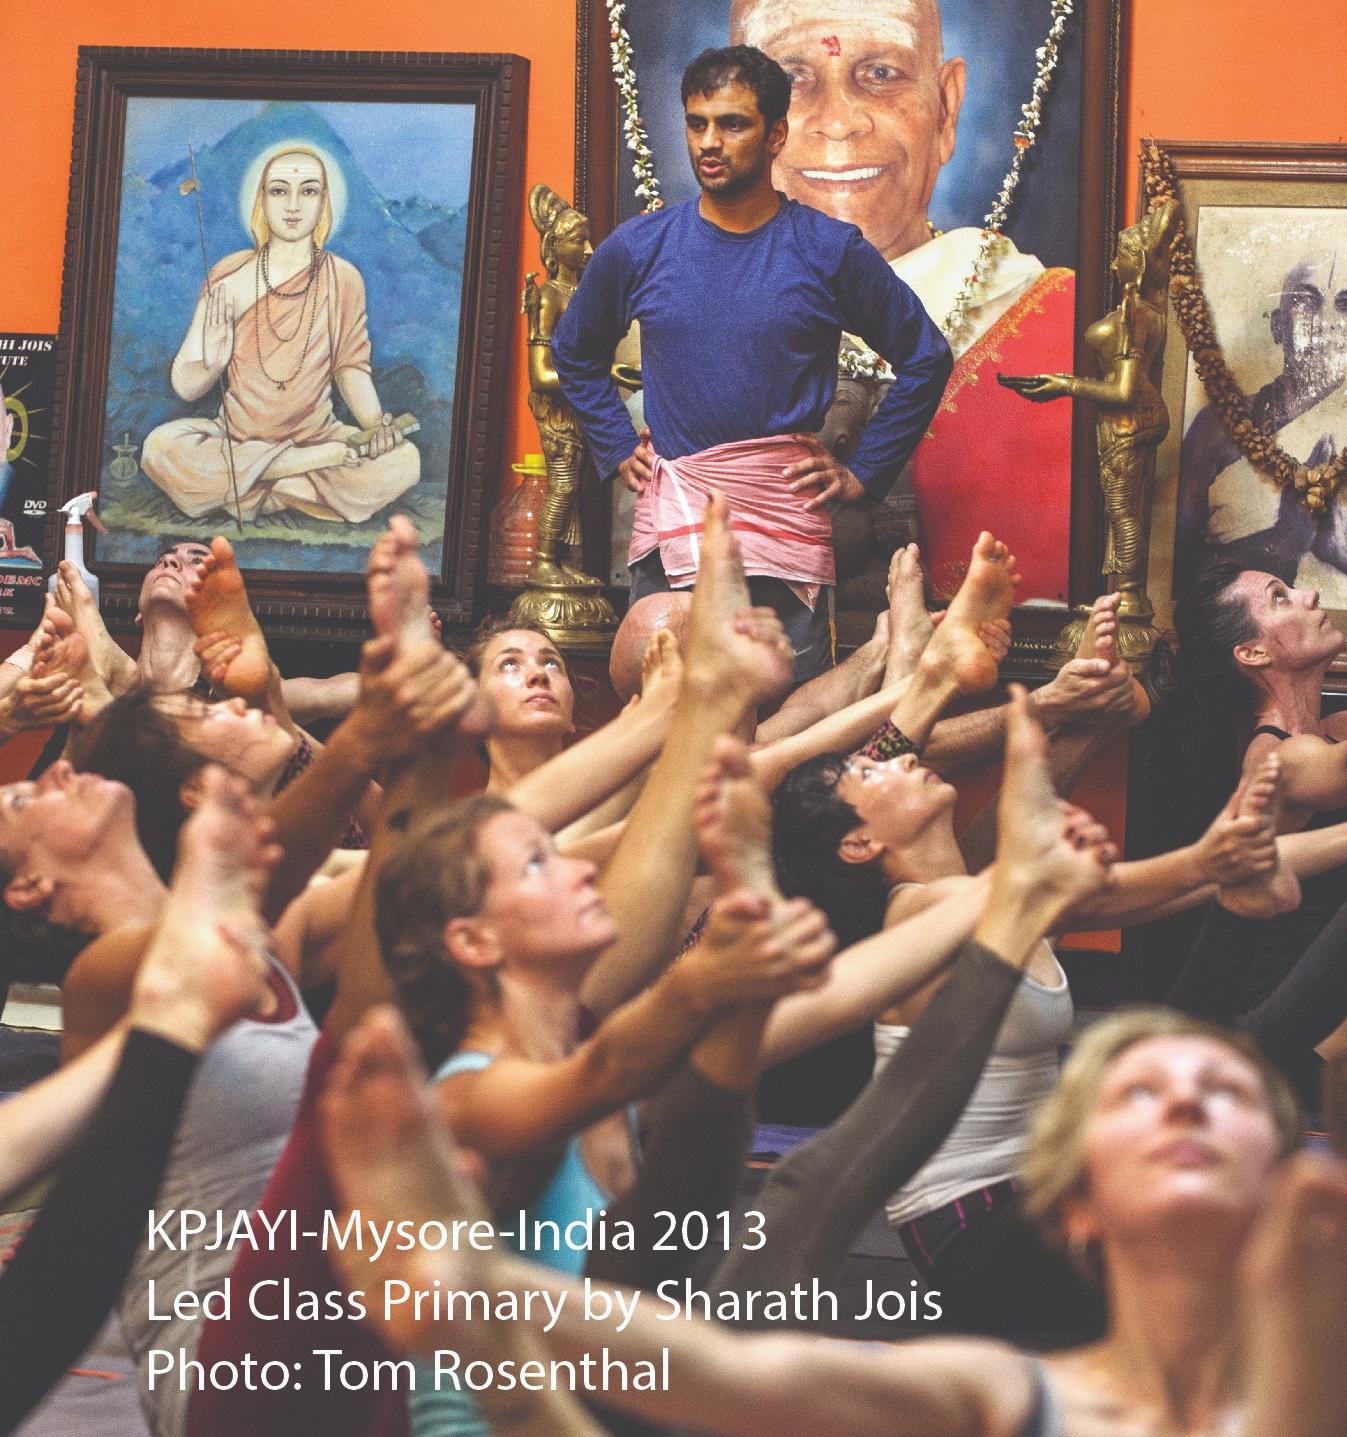 Natalia+Correa+ashtanga+Yoga+Mysore+upavista+2013.jpg